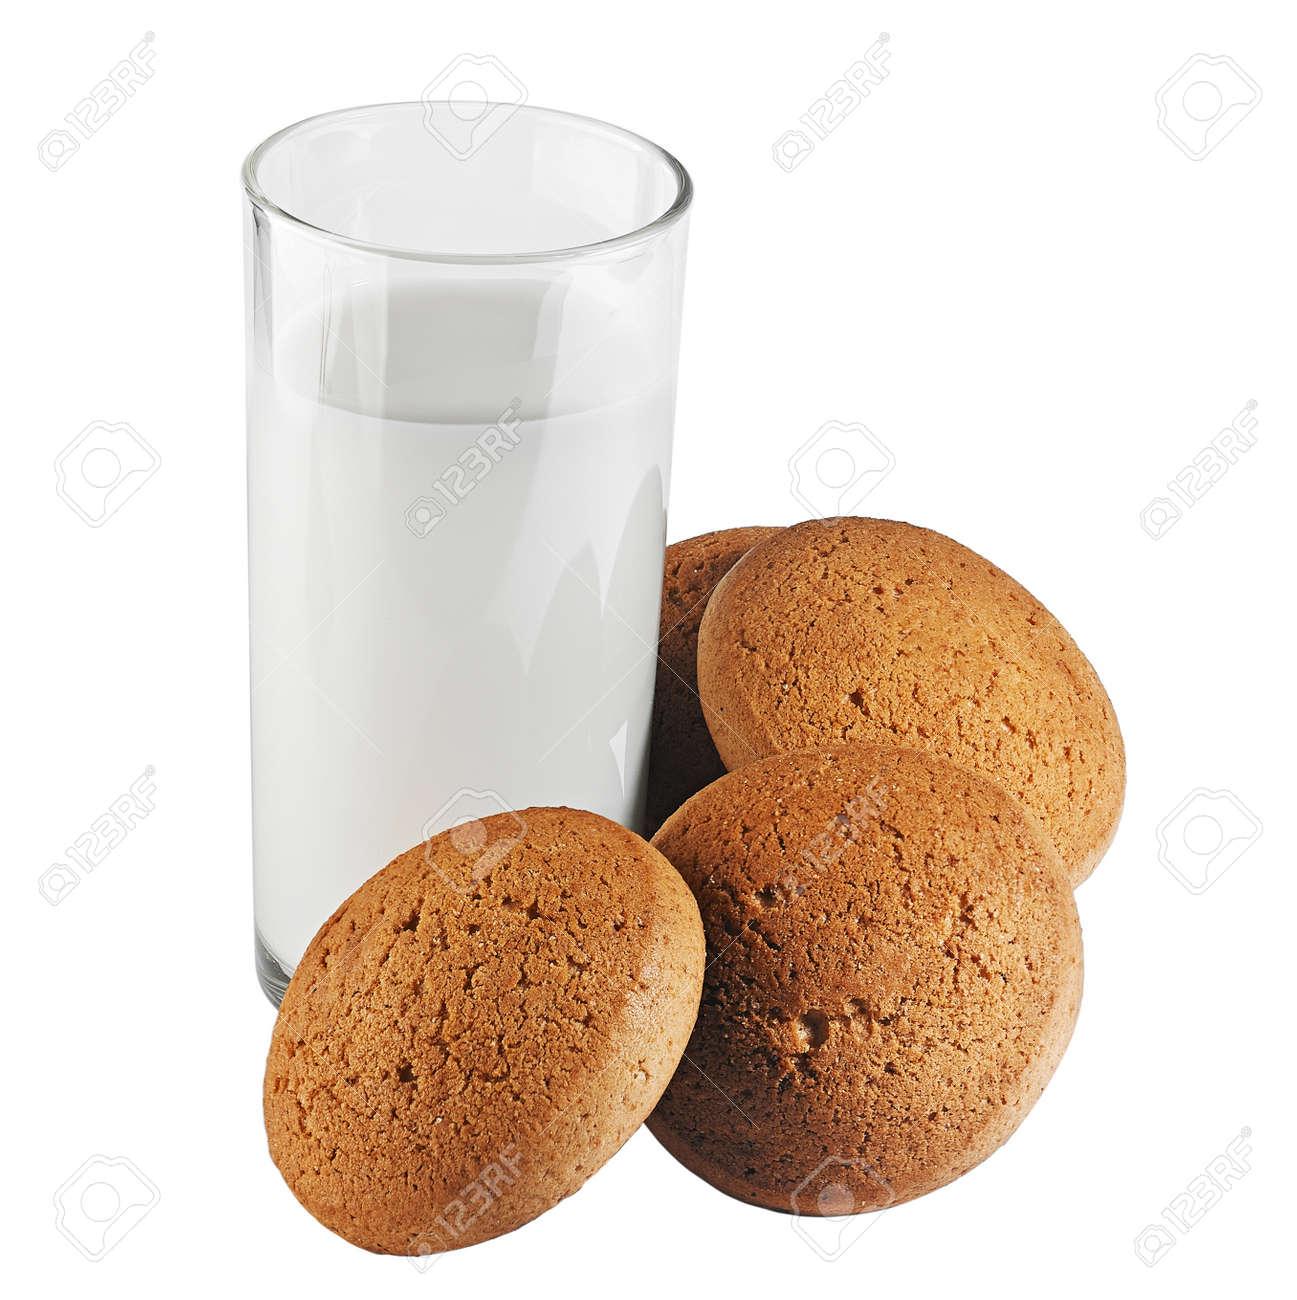 milk and cookies Stock Photo - 17667142